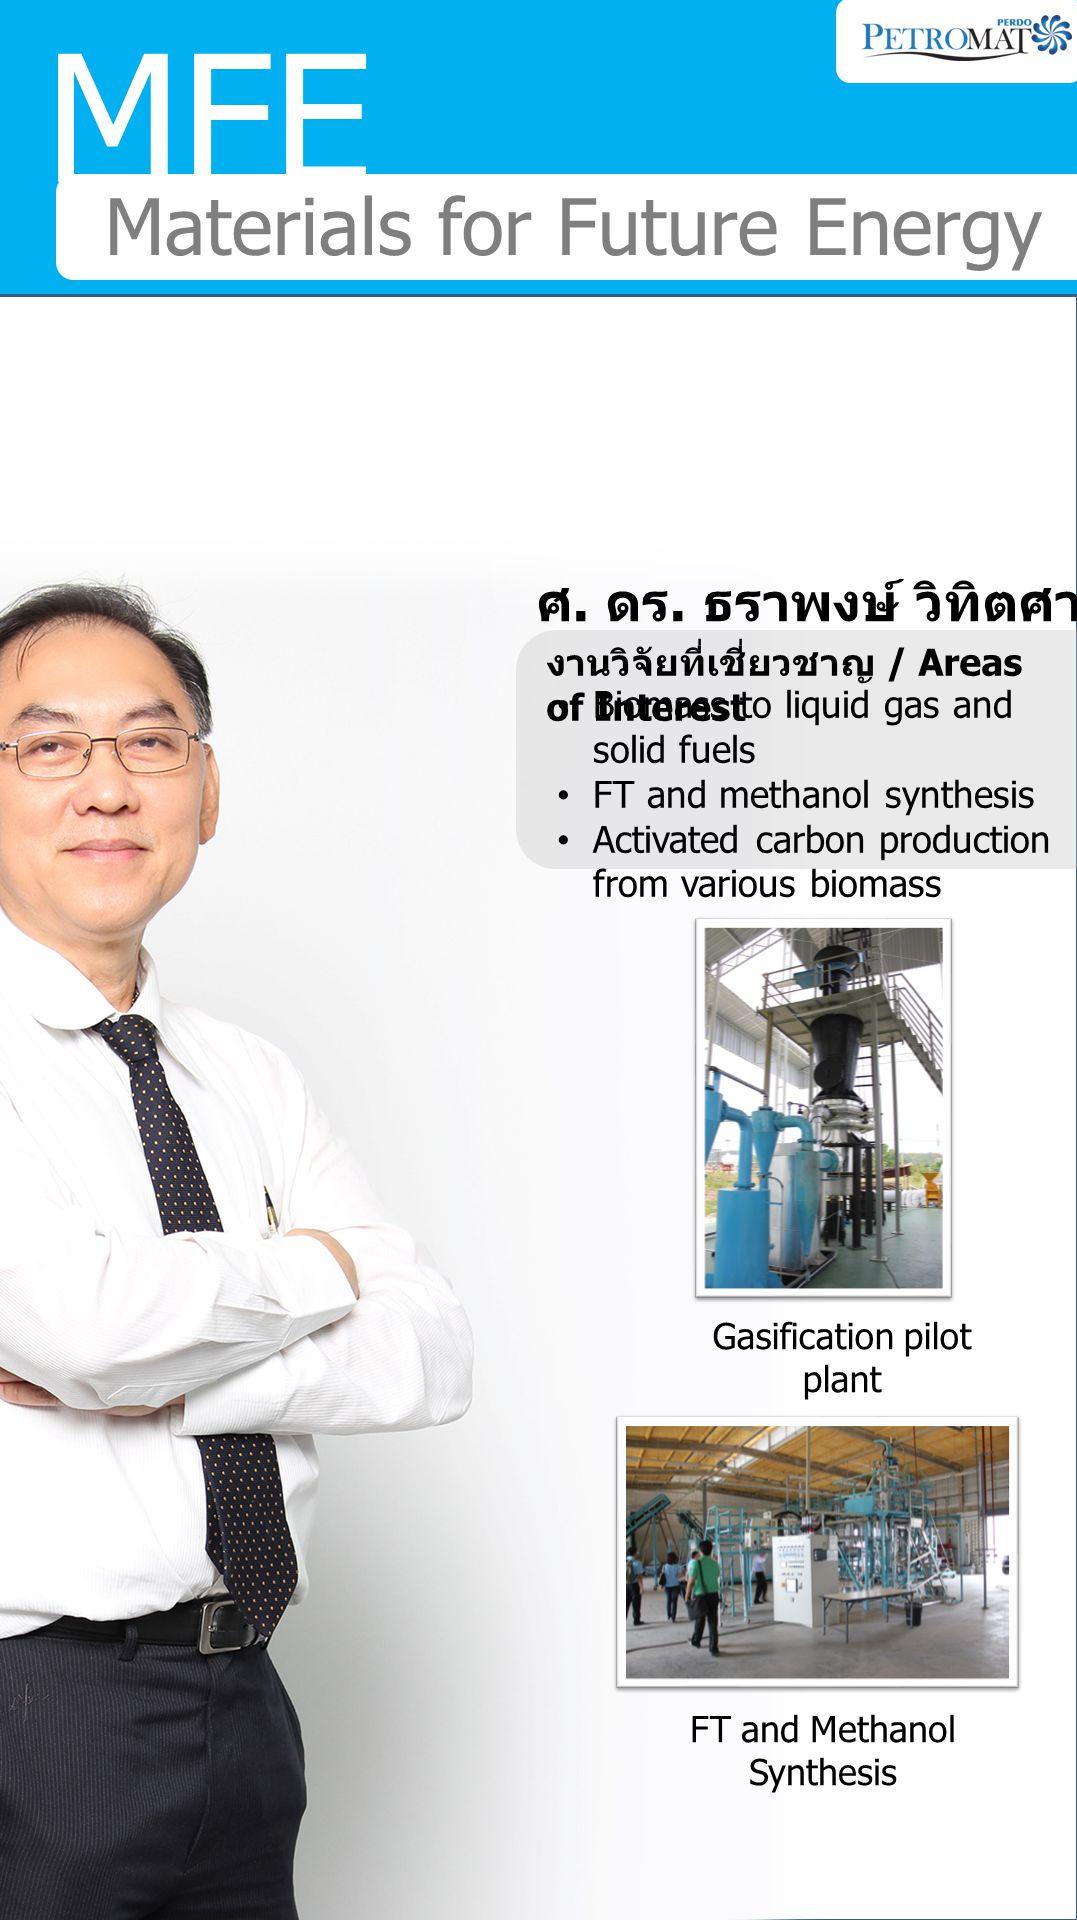 MFE Materials for Future Energy รศ. ดร. เก็จวลี พฤกษาทร งานวิจัยที่เชี่ยวชาญ / Areas of Interest Electrochemical Process Energy and environmental trea